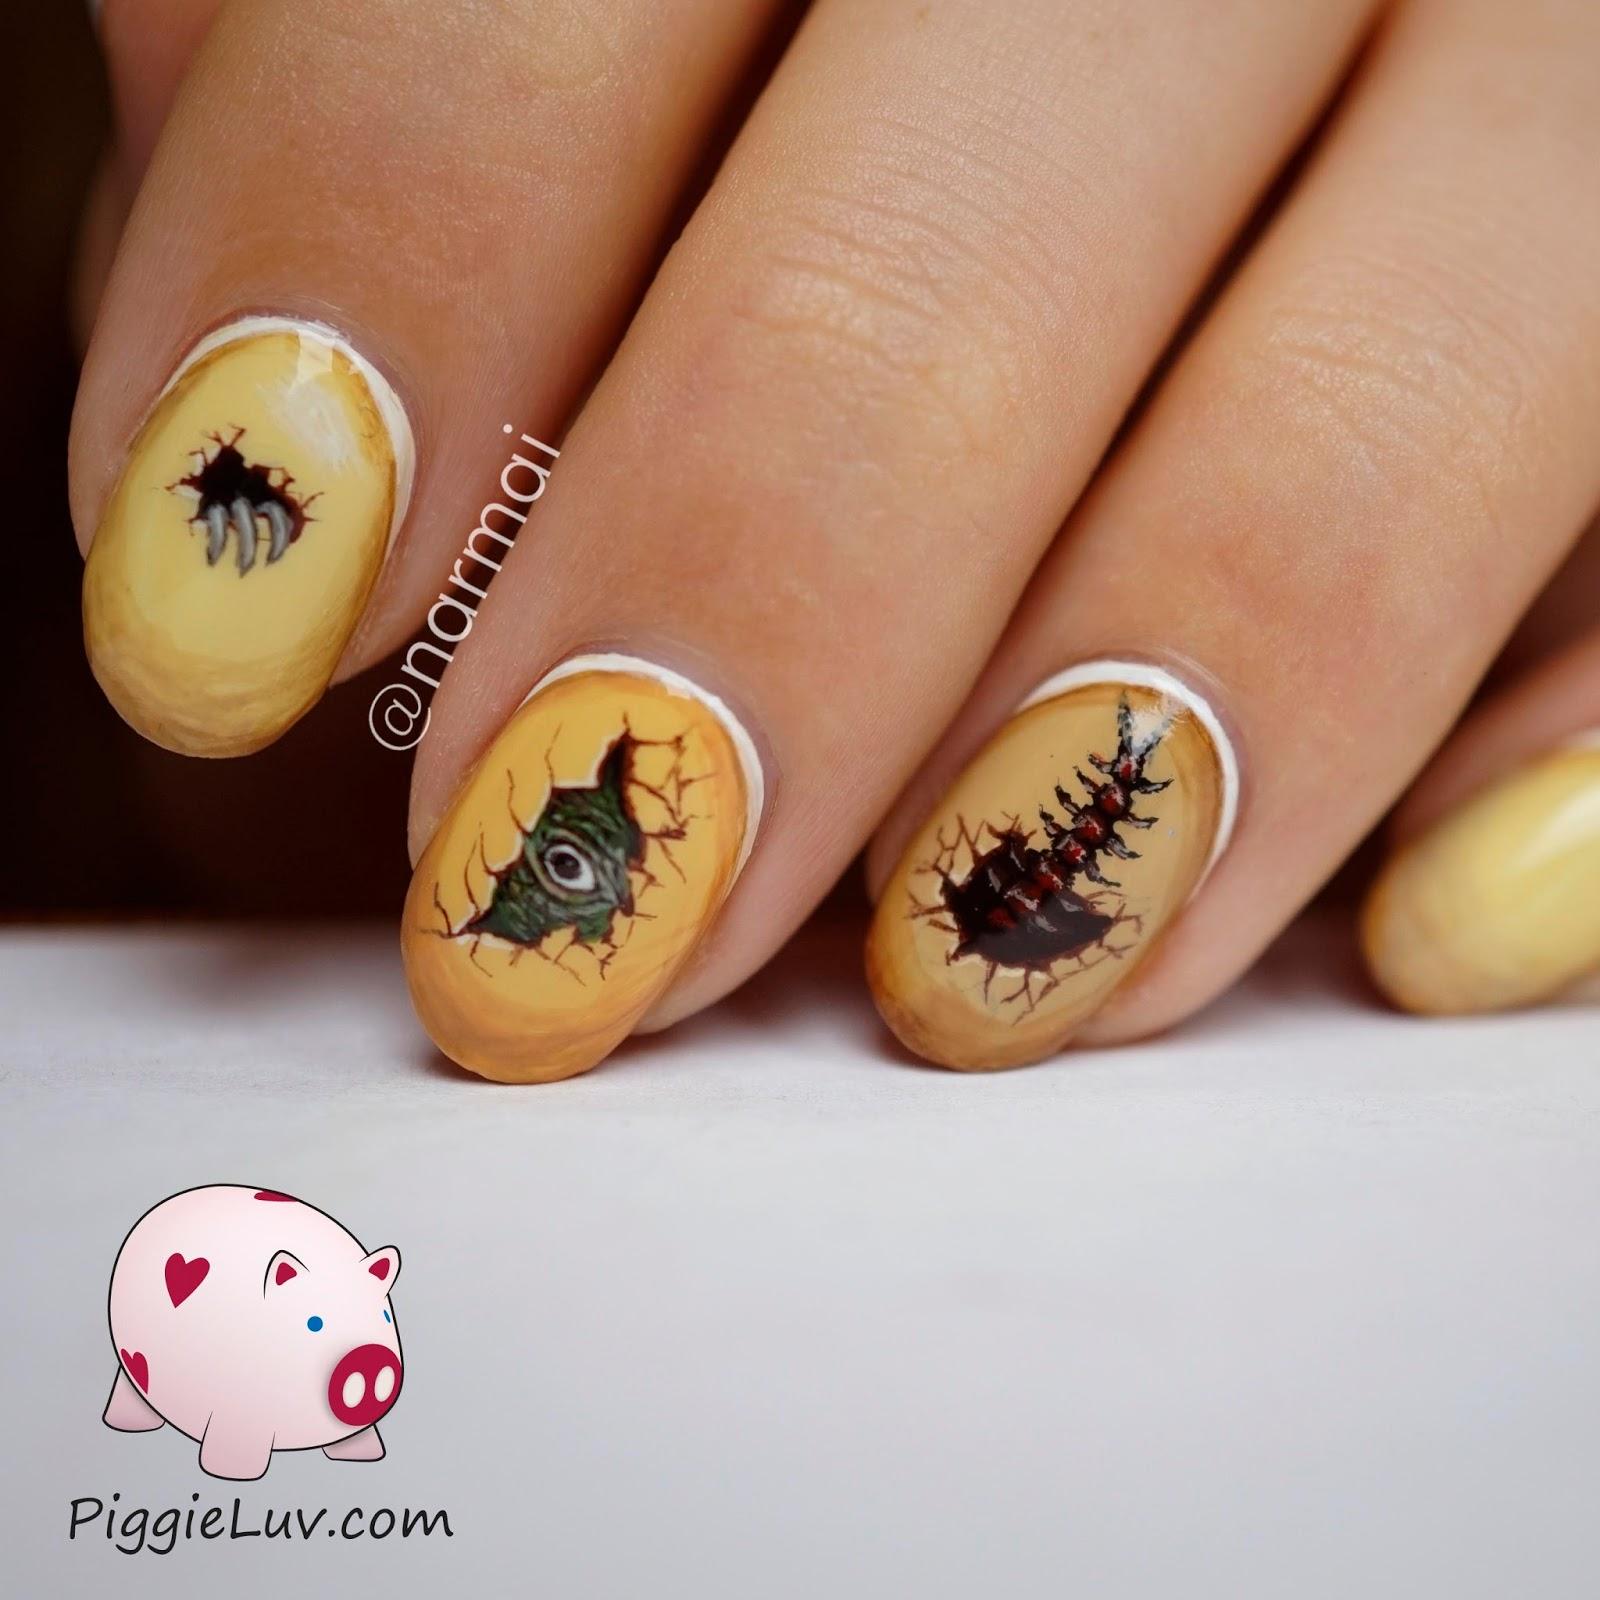 PiggieLuv: Freehand dinosaur eggs nail art